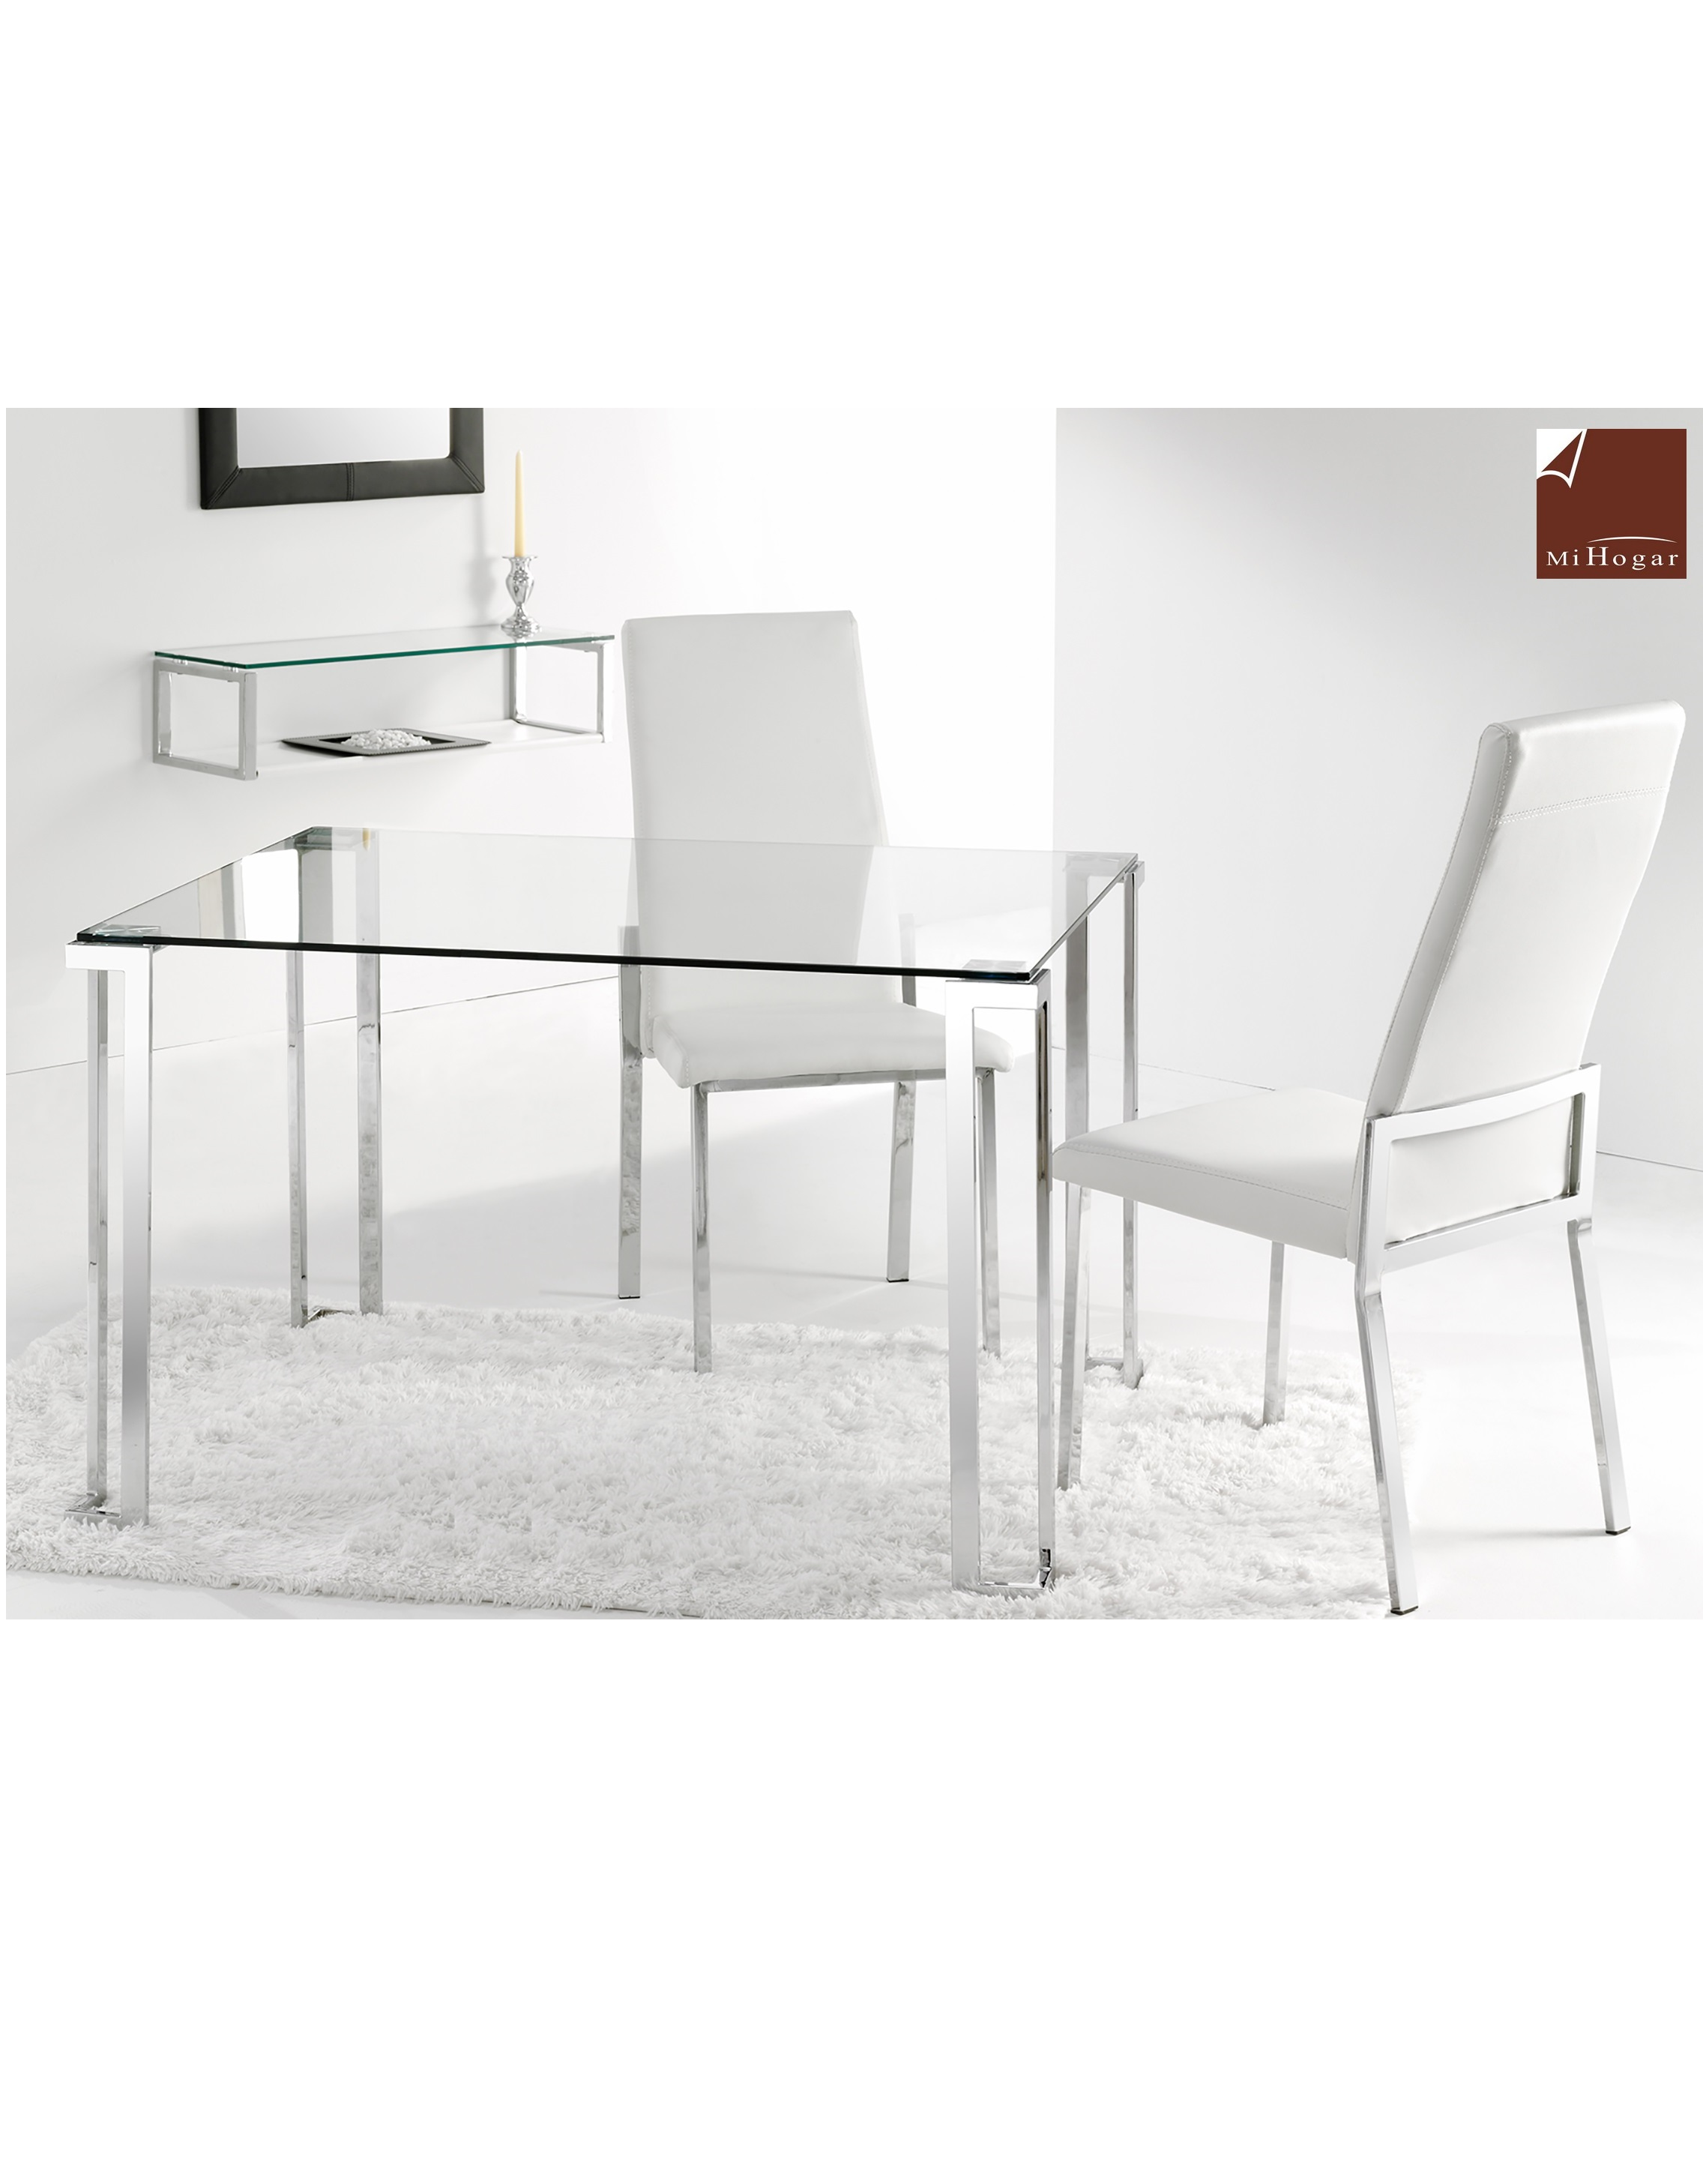 Mesa cristal atenas muebles mi hogar - Mesas estudio cristal ...